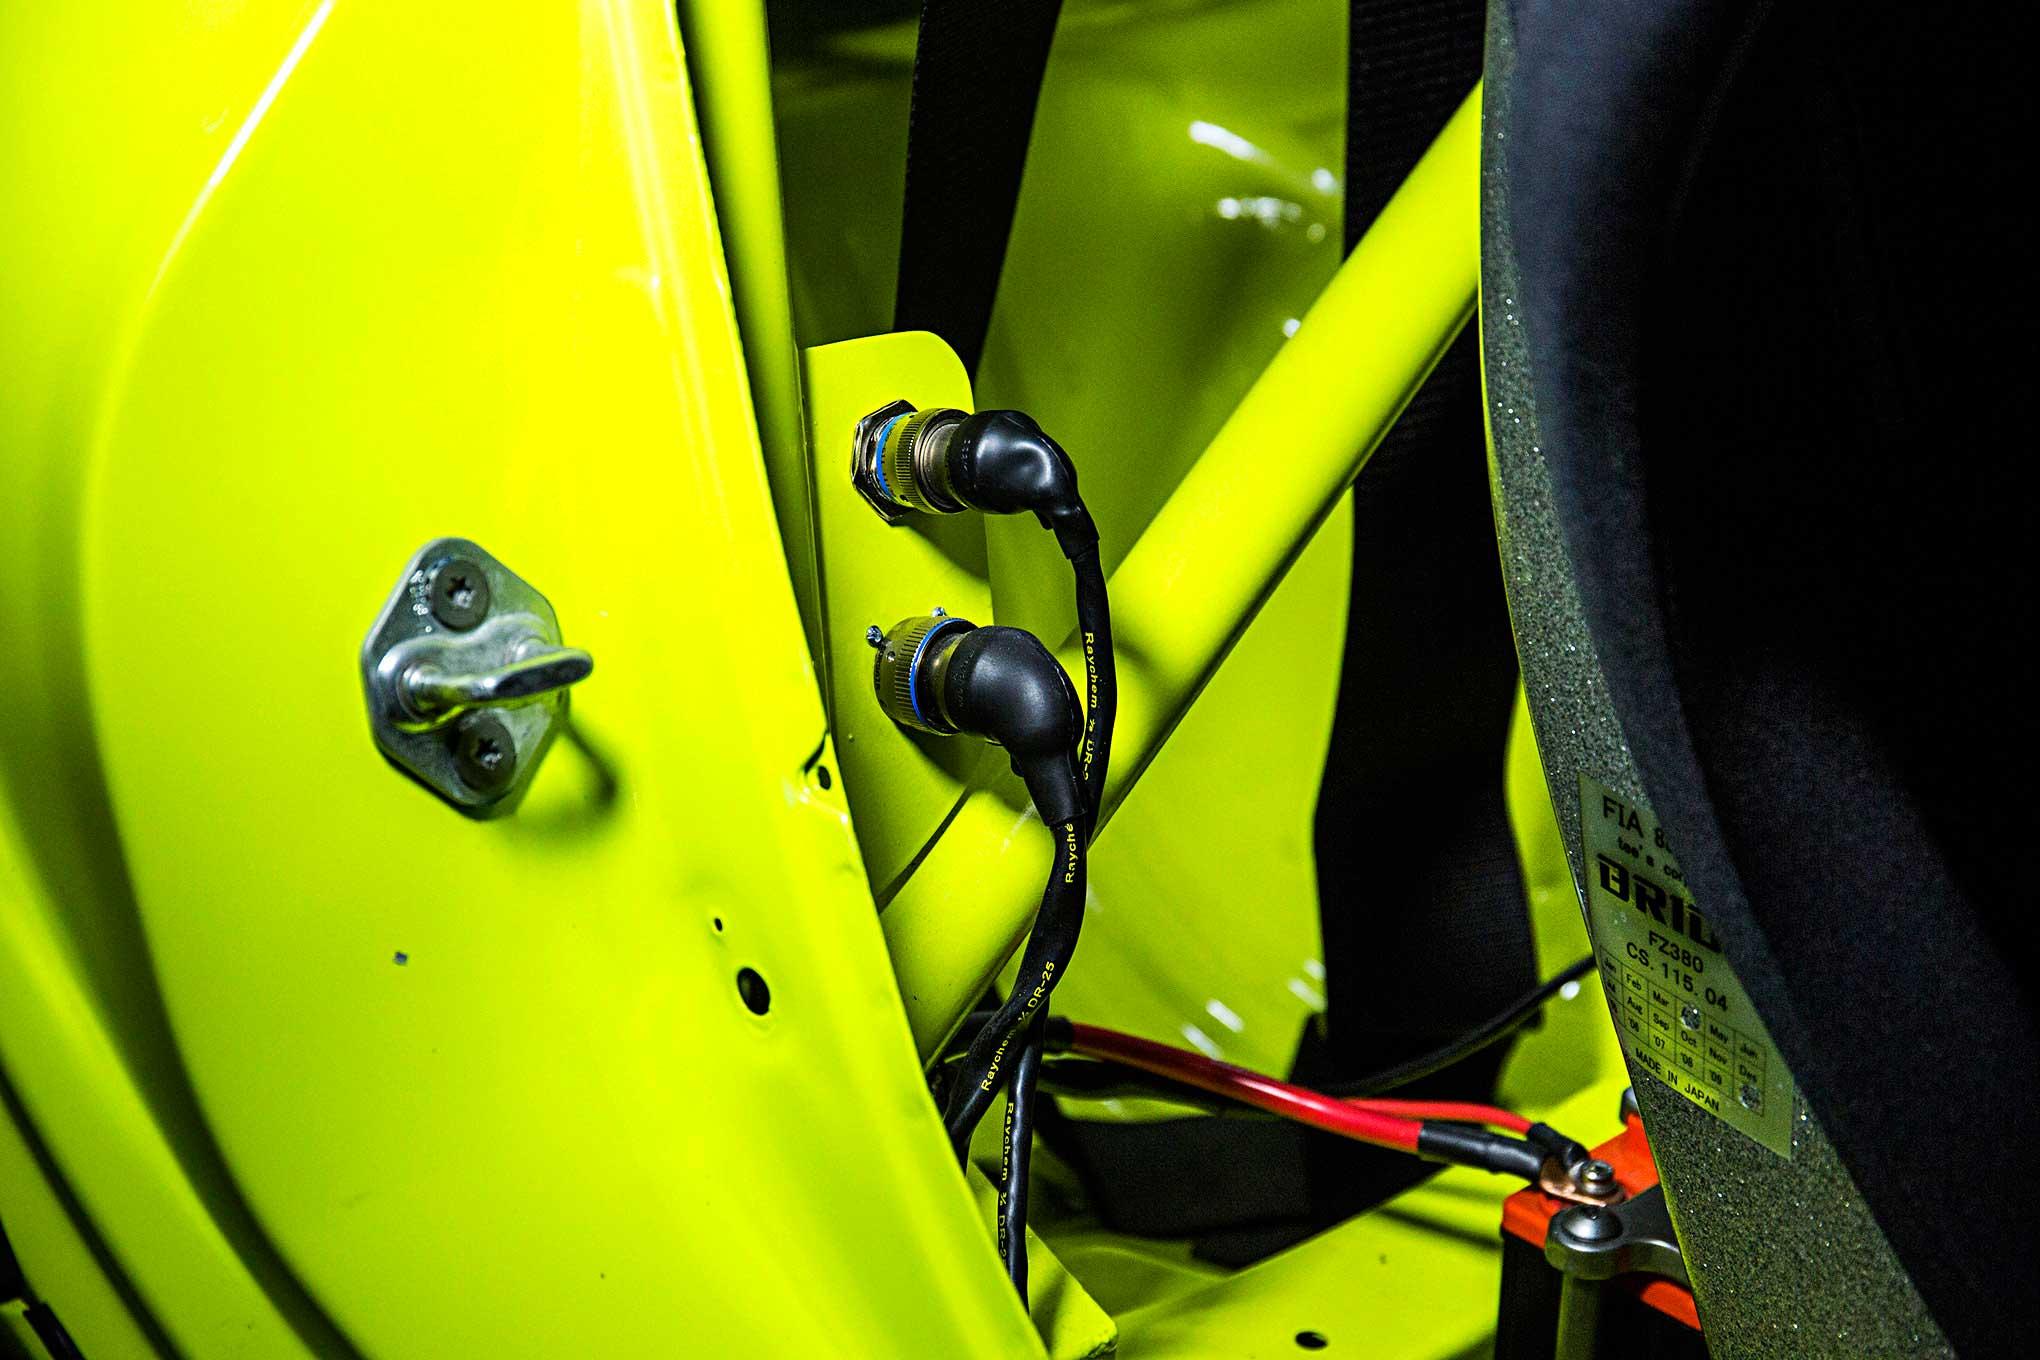 1993 mazda rx 7 shine bright1993 mazda rx 7 custom rywire wiring harness [ 2040 x 1360 Pixel ]